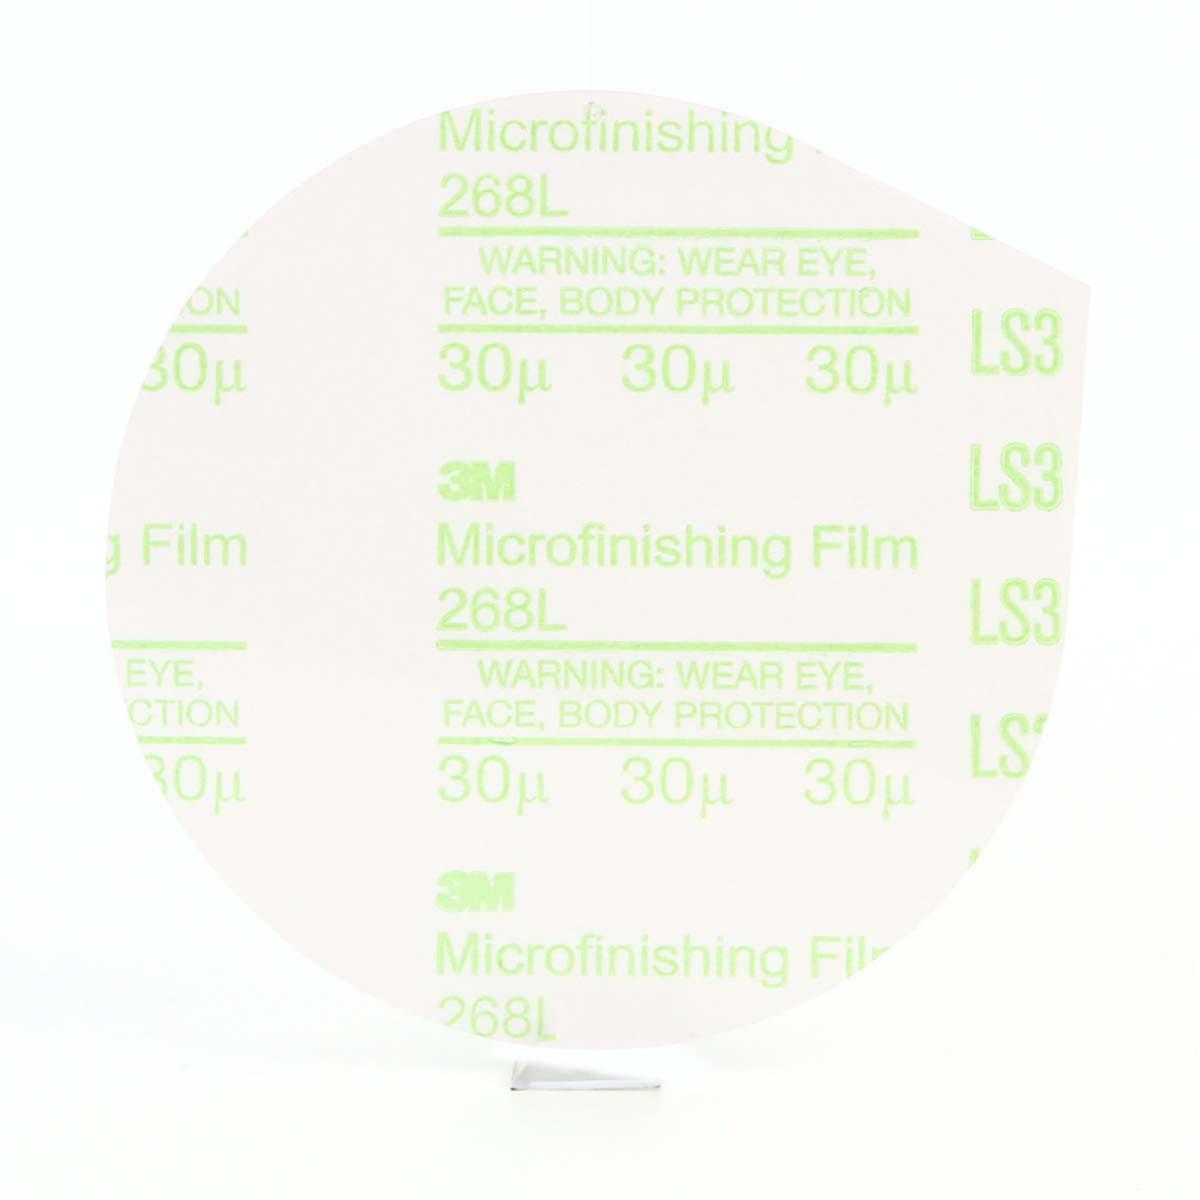 3M Microfinishing PSA Film Type D Disc 268L, 5 in x NH 30 Micron